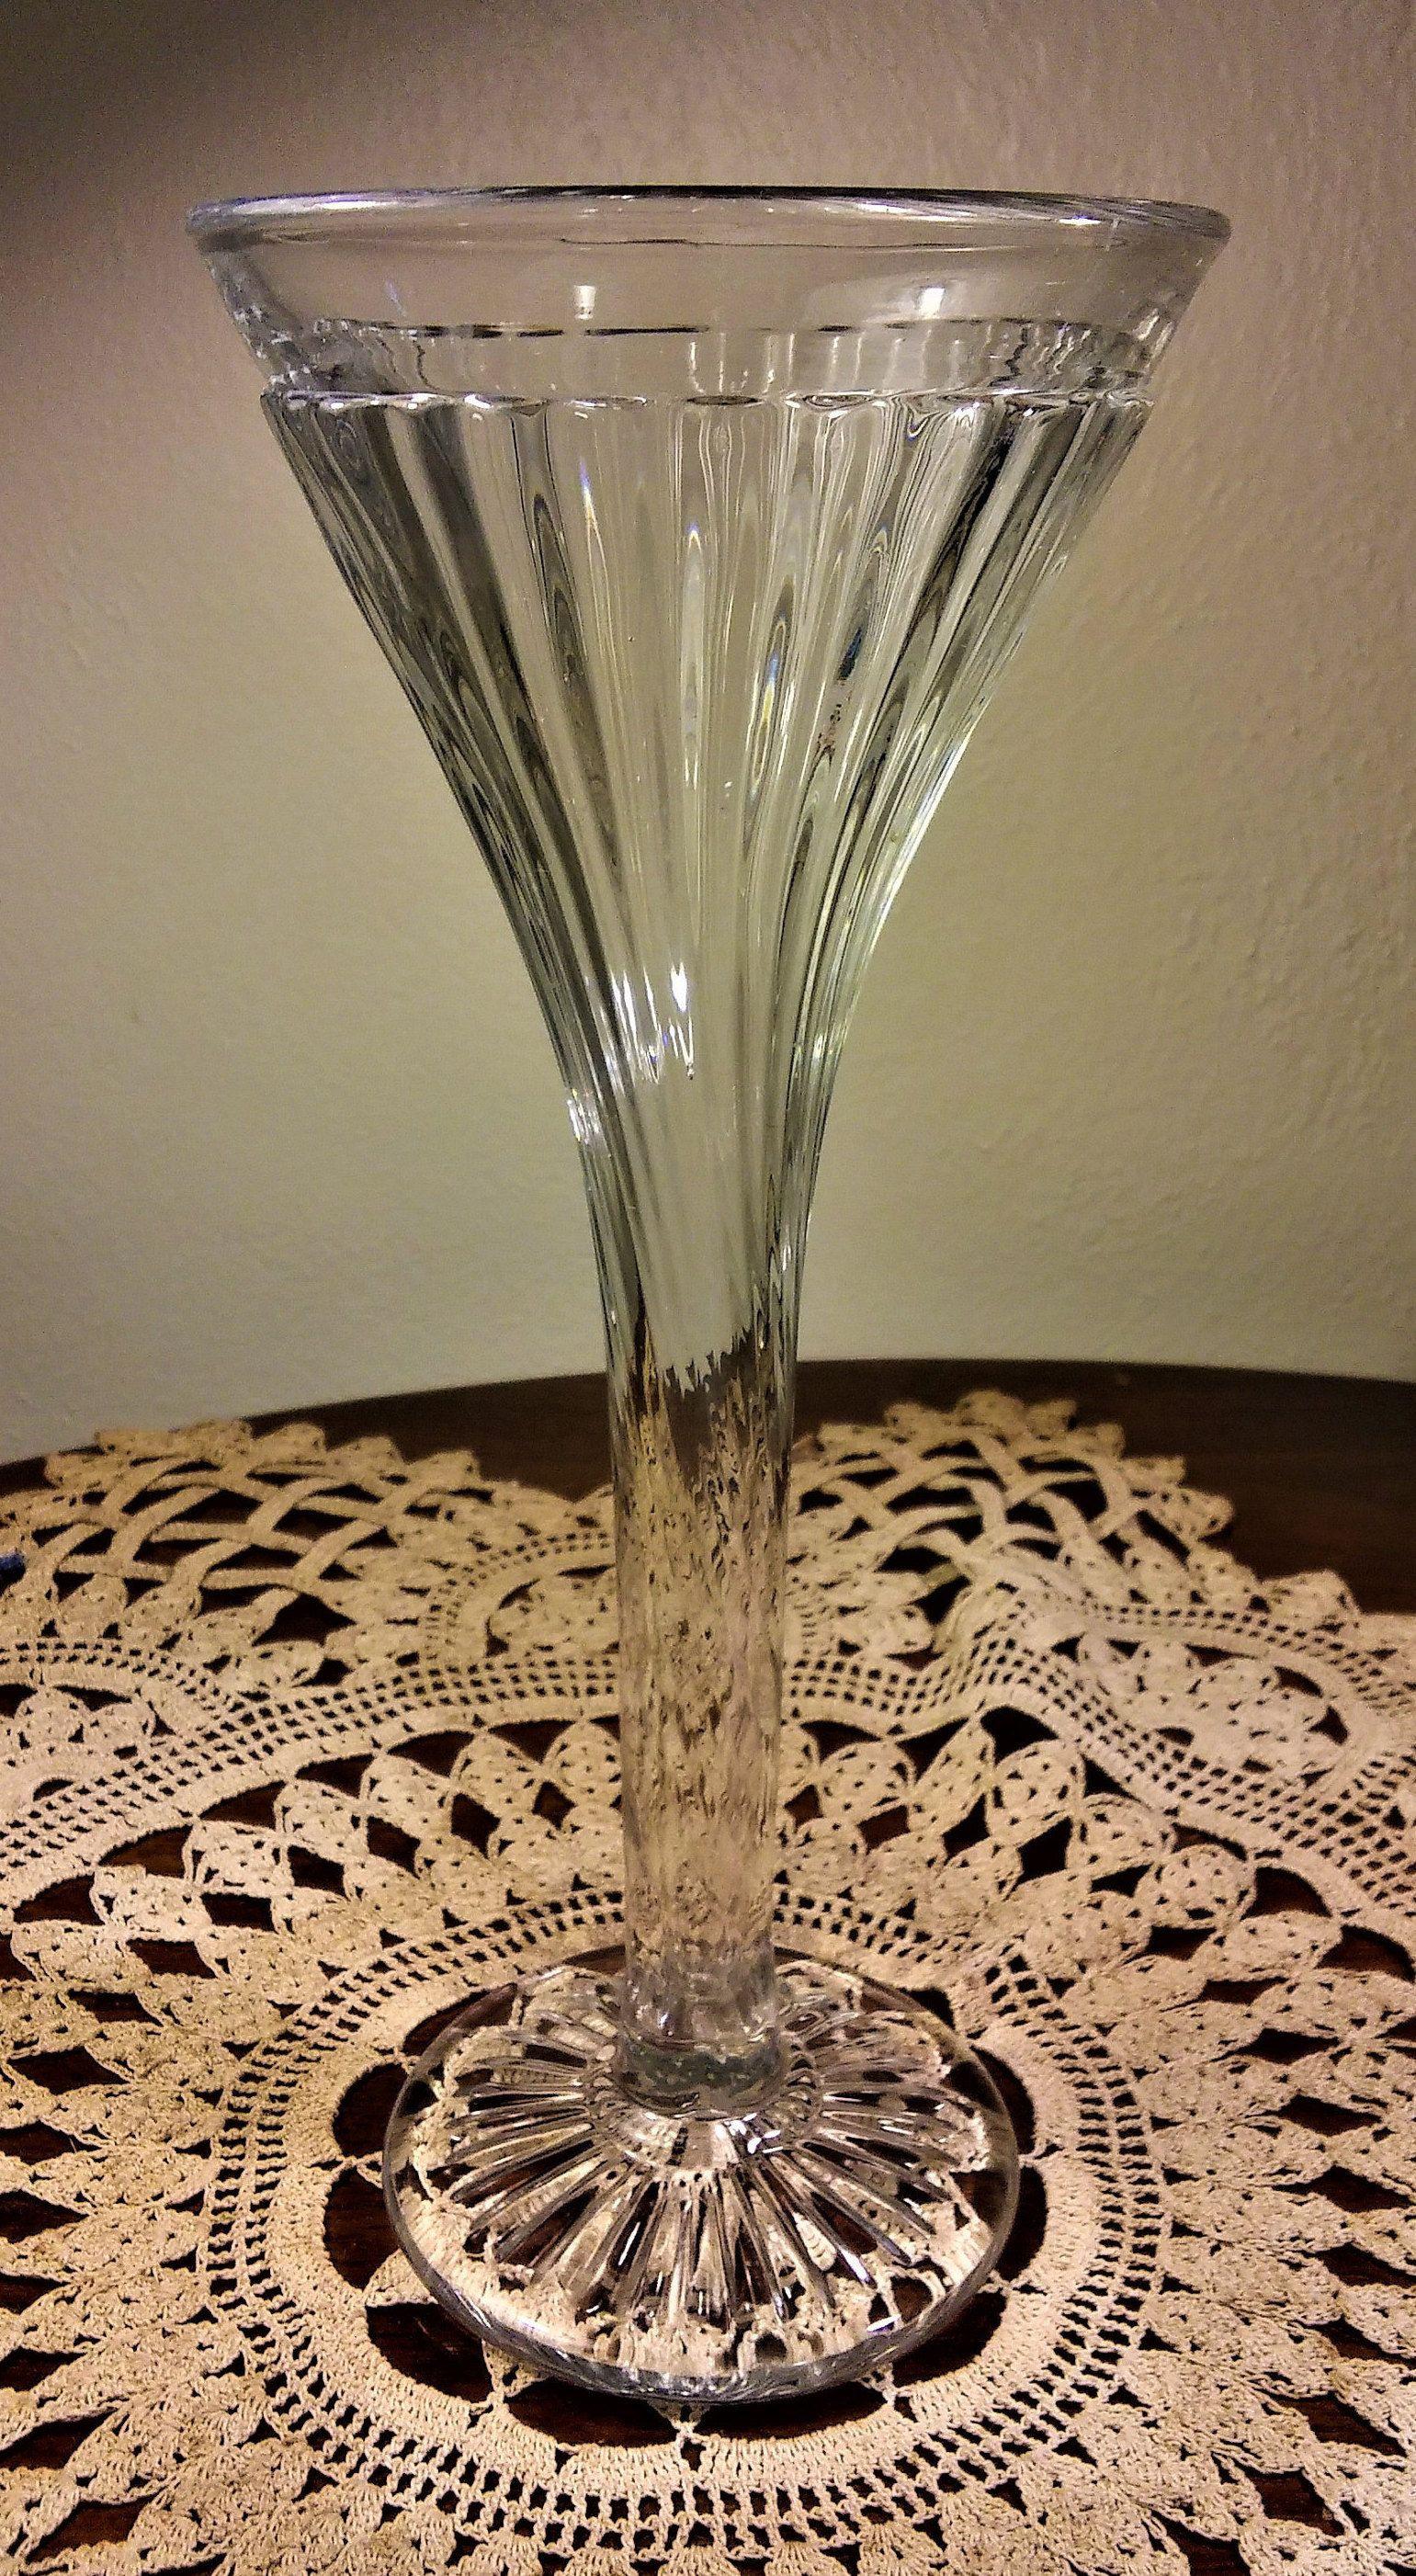 Old Waterford Crystal Vase Of Glass Trumpet Vase Photos Vintage Clear Pressed Glass Trumpet Vase Throughout Glass Trumpet Vase Photos Vintage Clear Pressed Glass Trumpet Vase